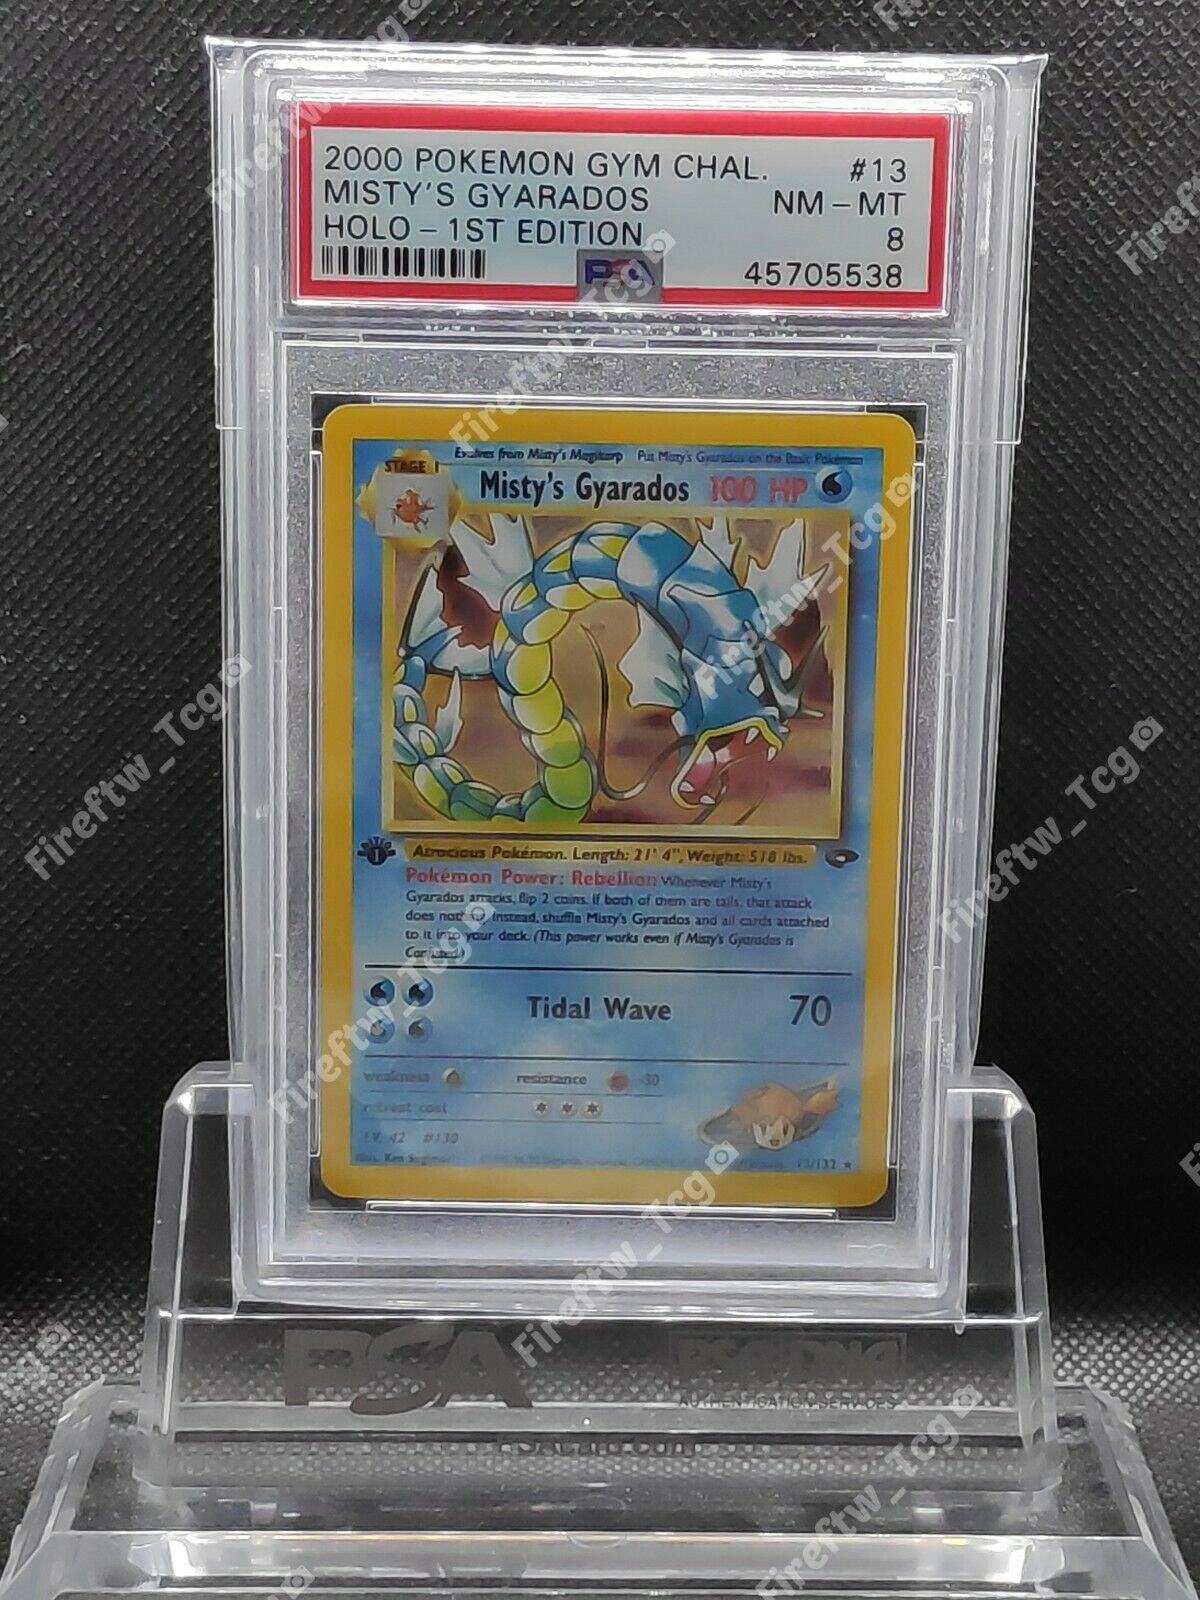 Pokemon Card Gym Challenge 1st Edition PSA 8 MINT Mistys Gyarados Holo 13132